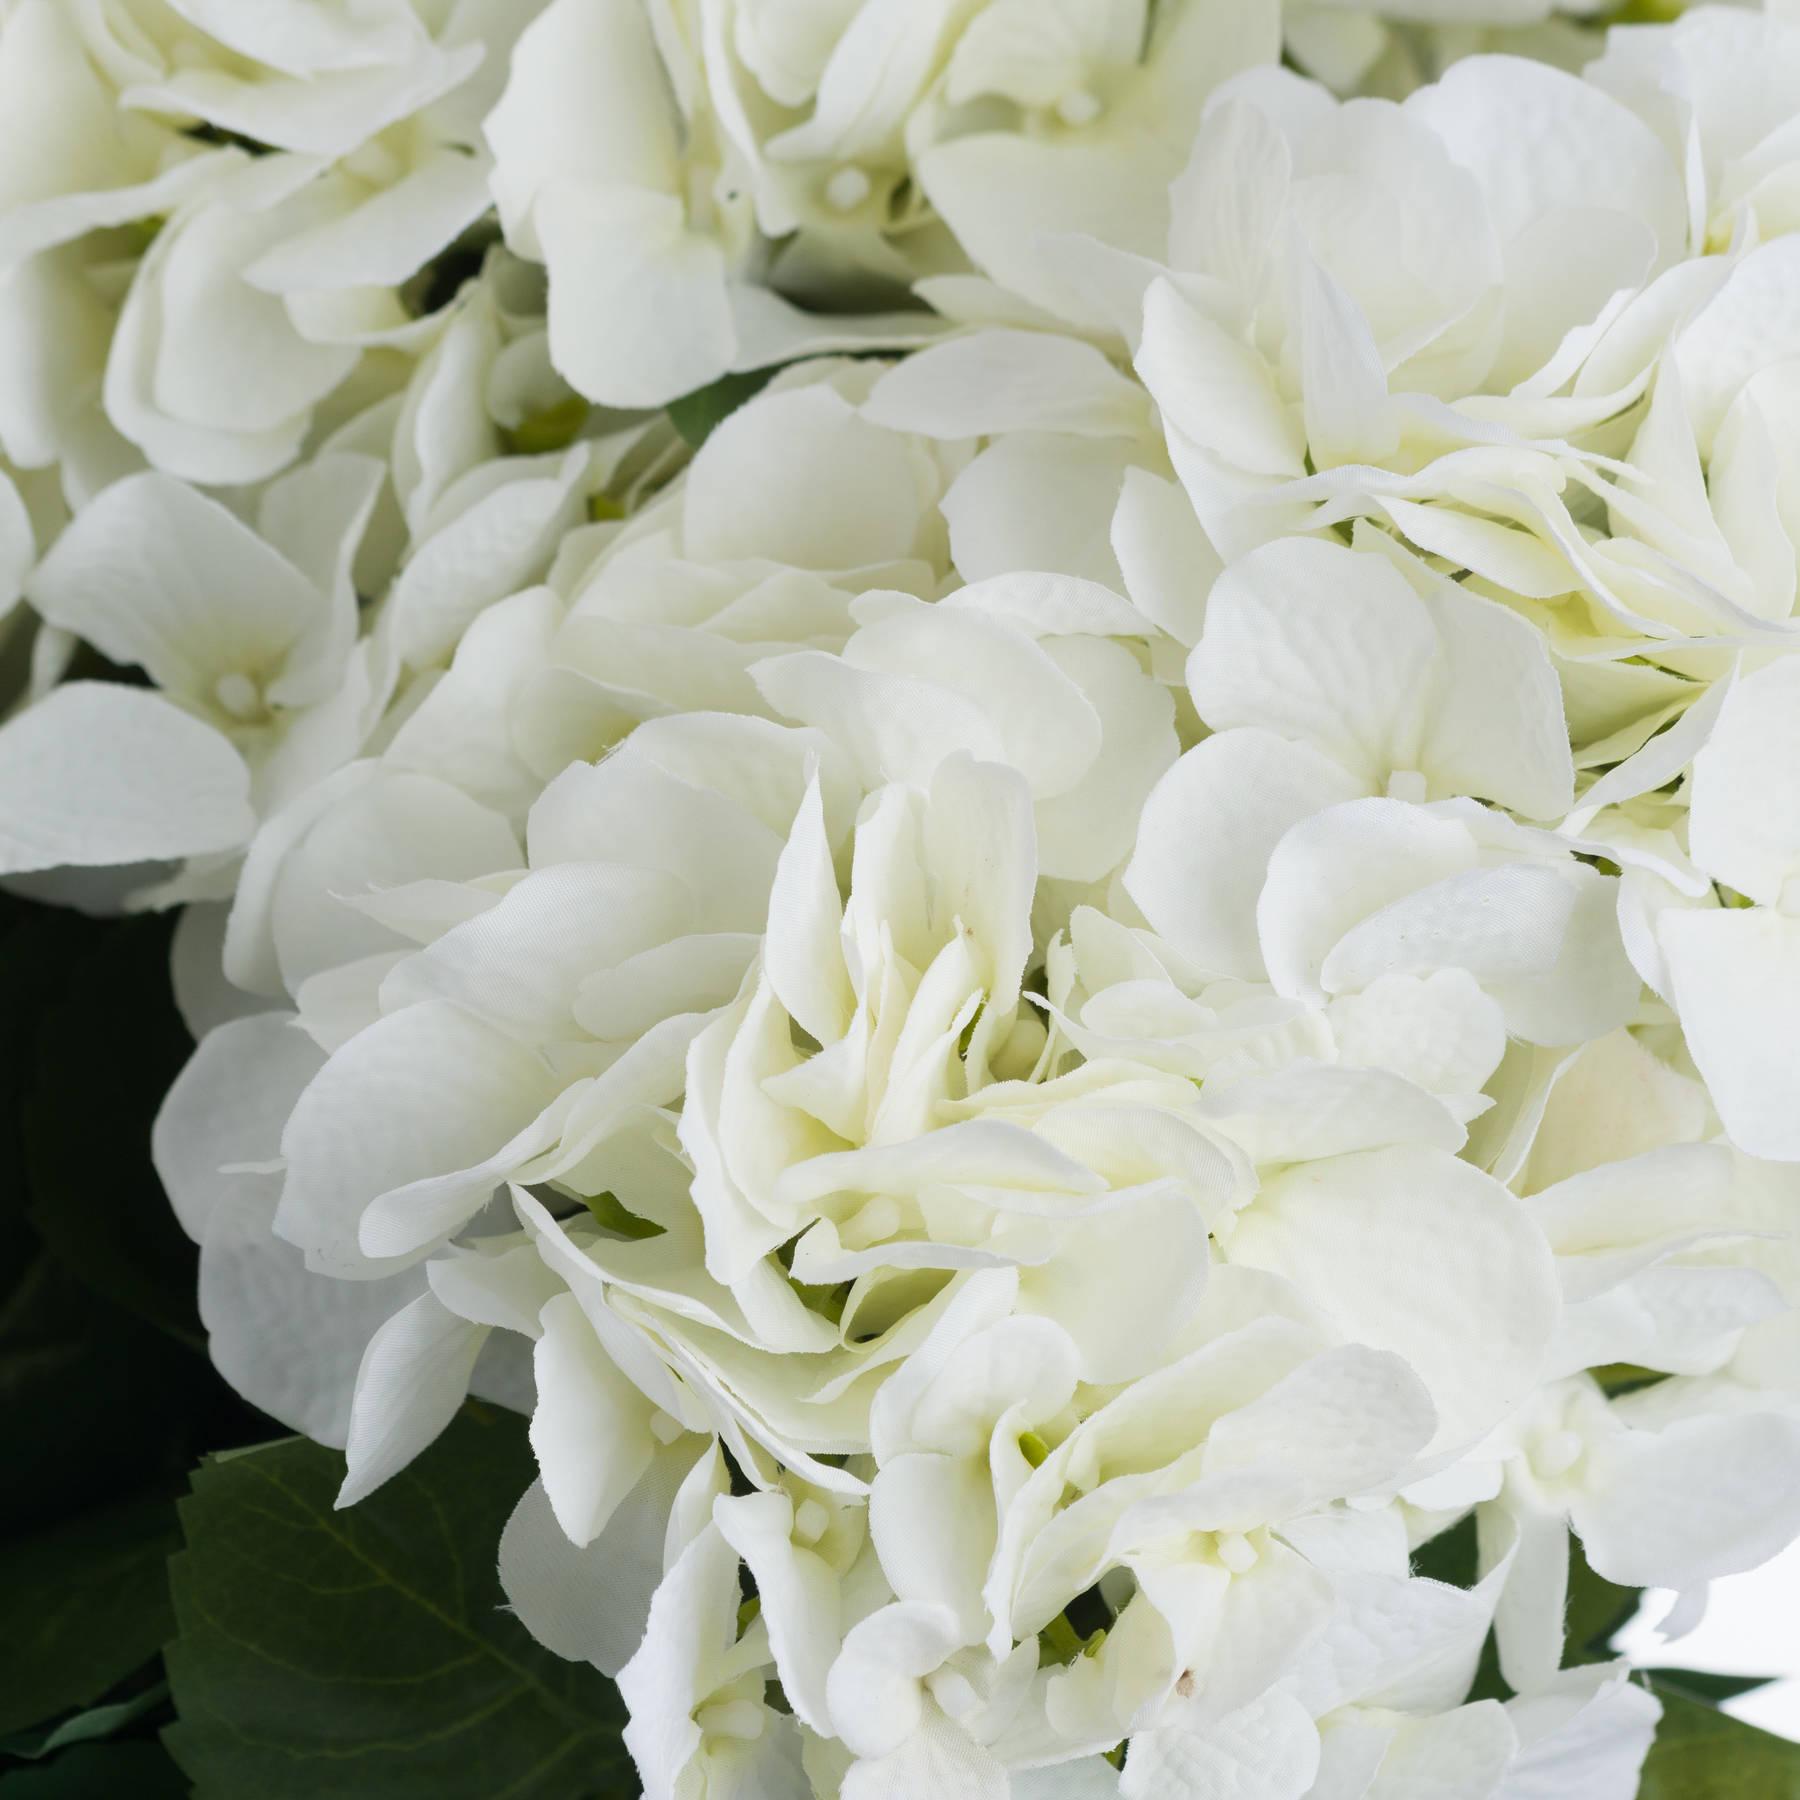 White Hydrangea Bouquet - Image 5